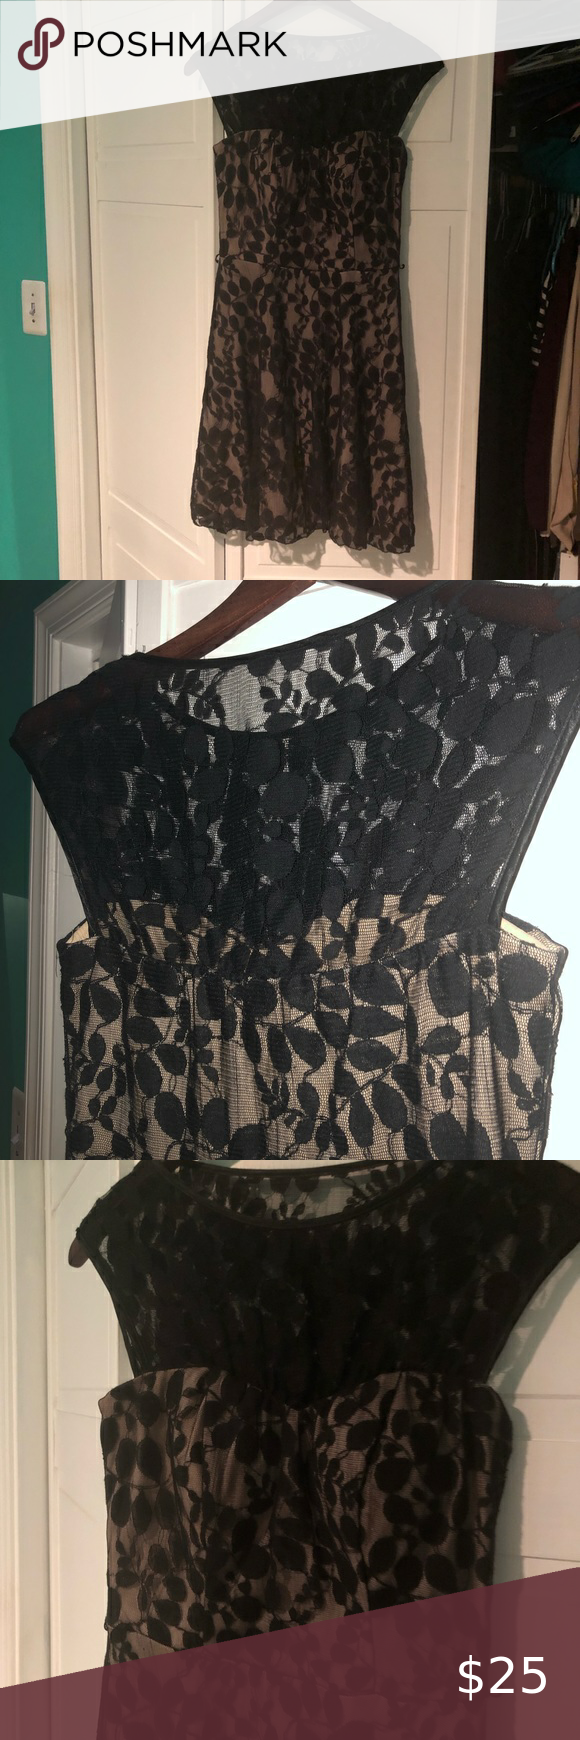 Black Lace Dress With Sheer Top Black Lace Dress Lace Dress Speechless Dress [ 1740 x 580 Pixel ]